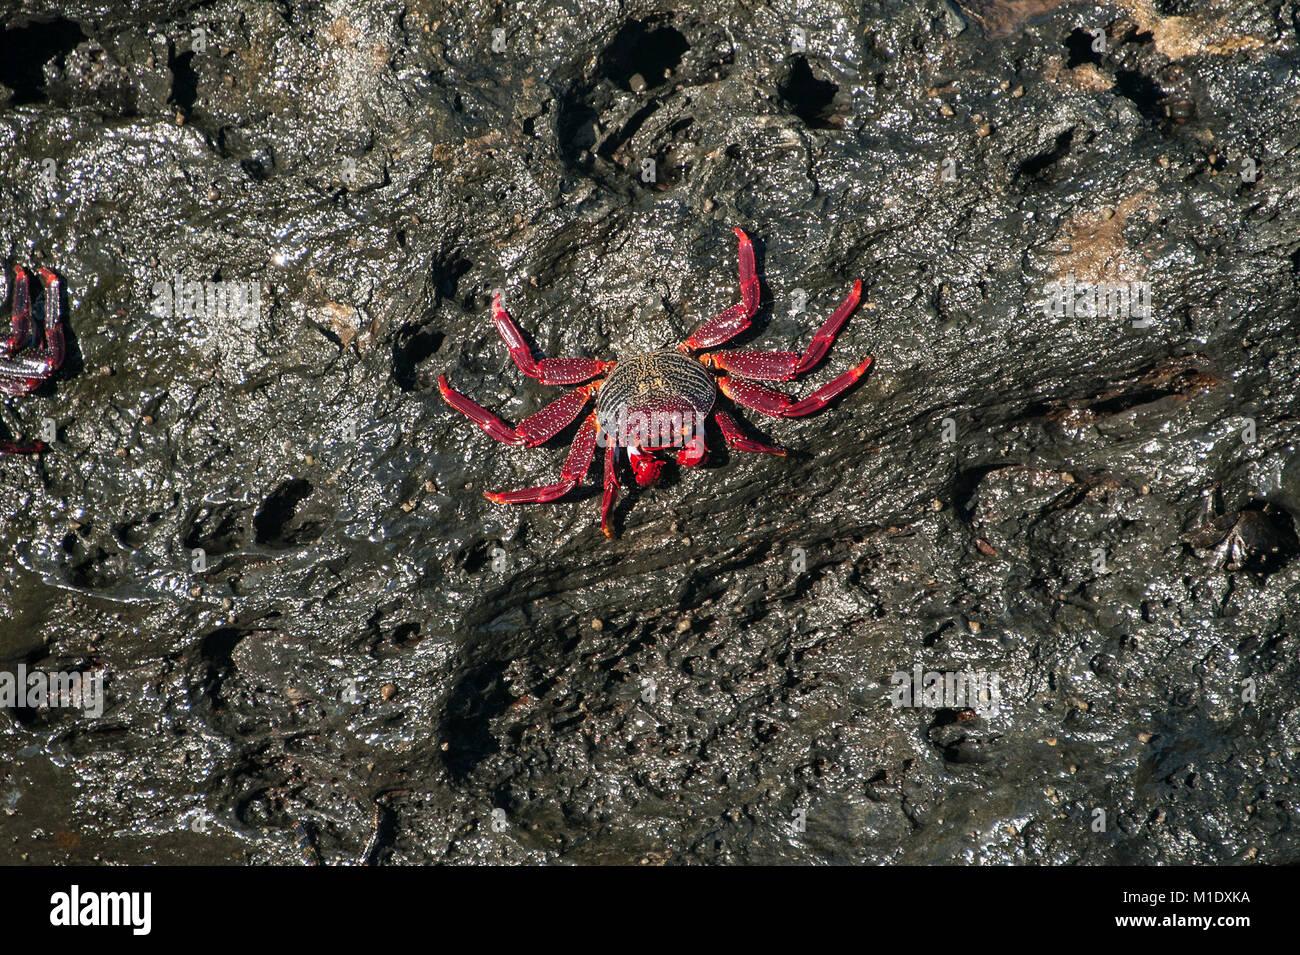 A red cliff crab on a rock on the coast near San Juan de la Rambla. - Stock Image